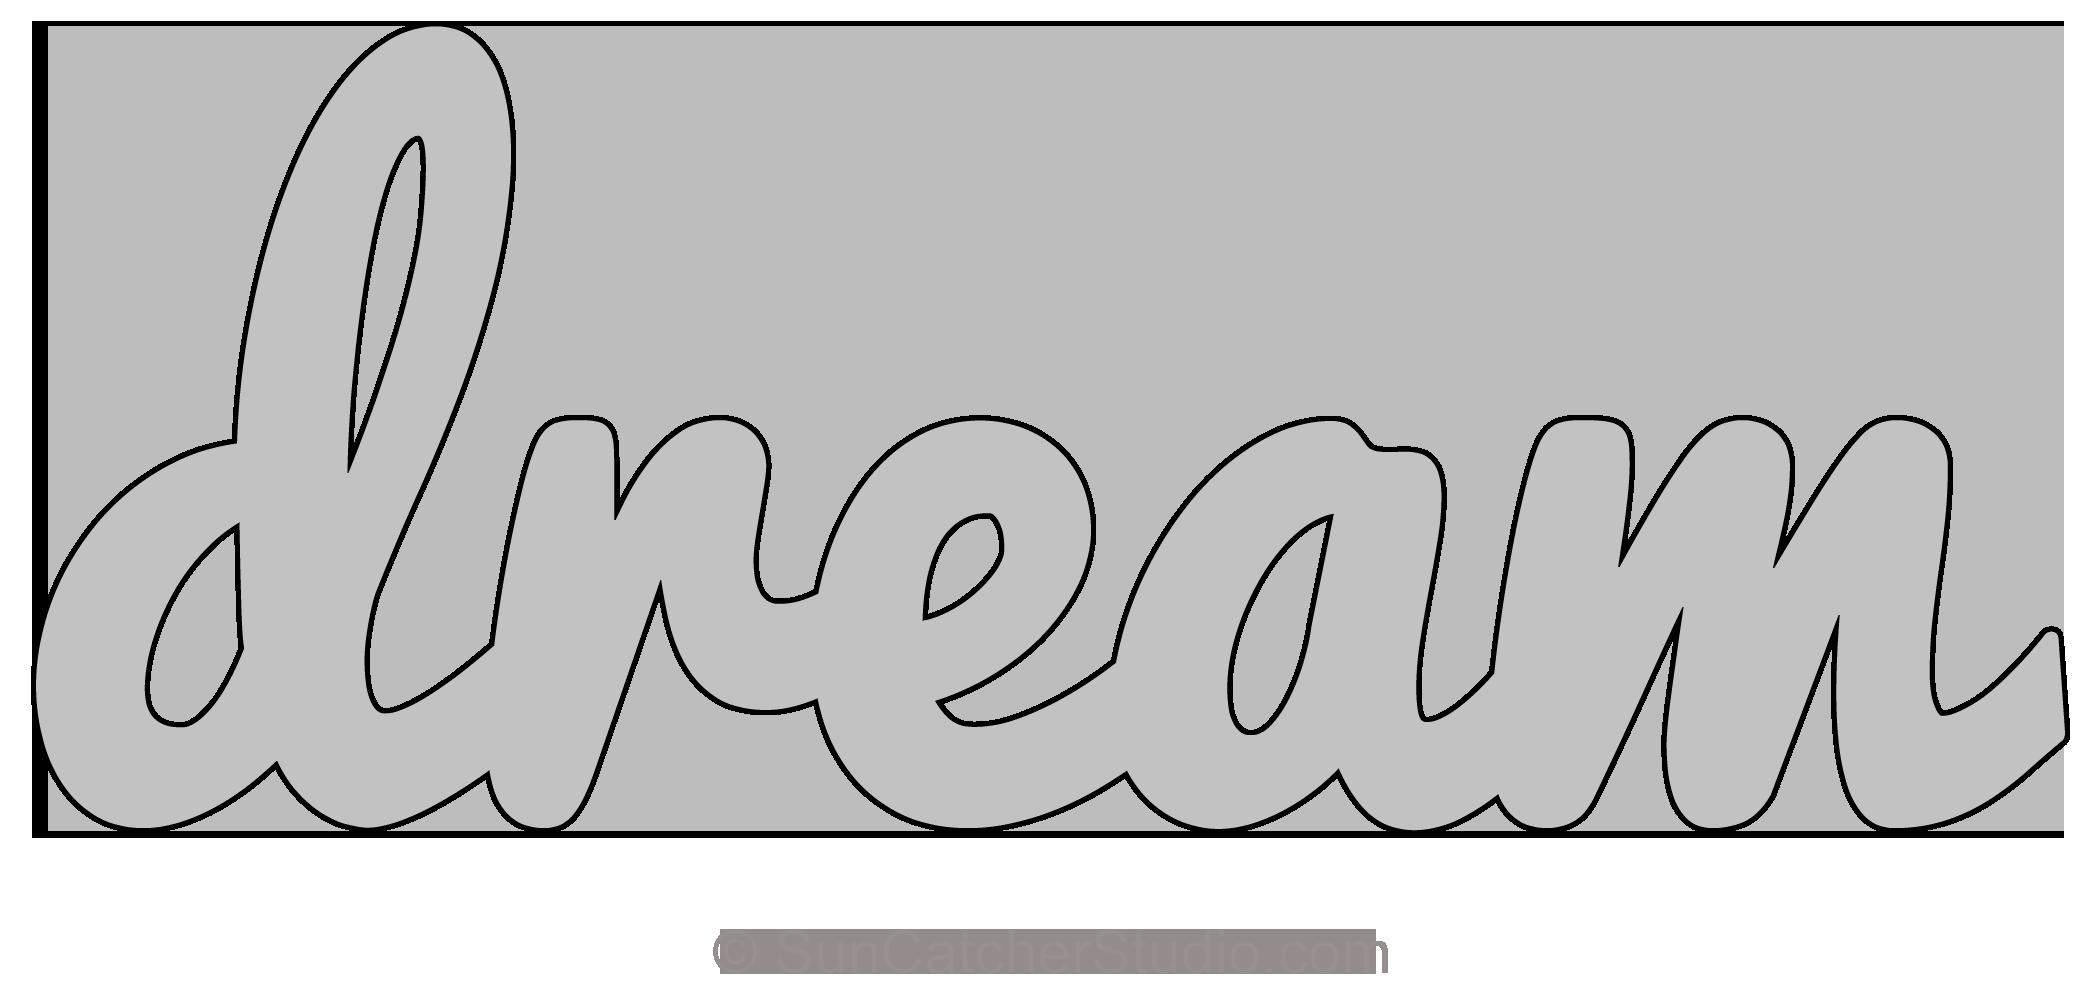 Free Word Art Template Elegant Dream Pattern Template Stencil Printable Word Art